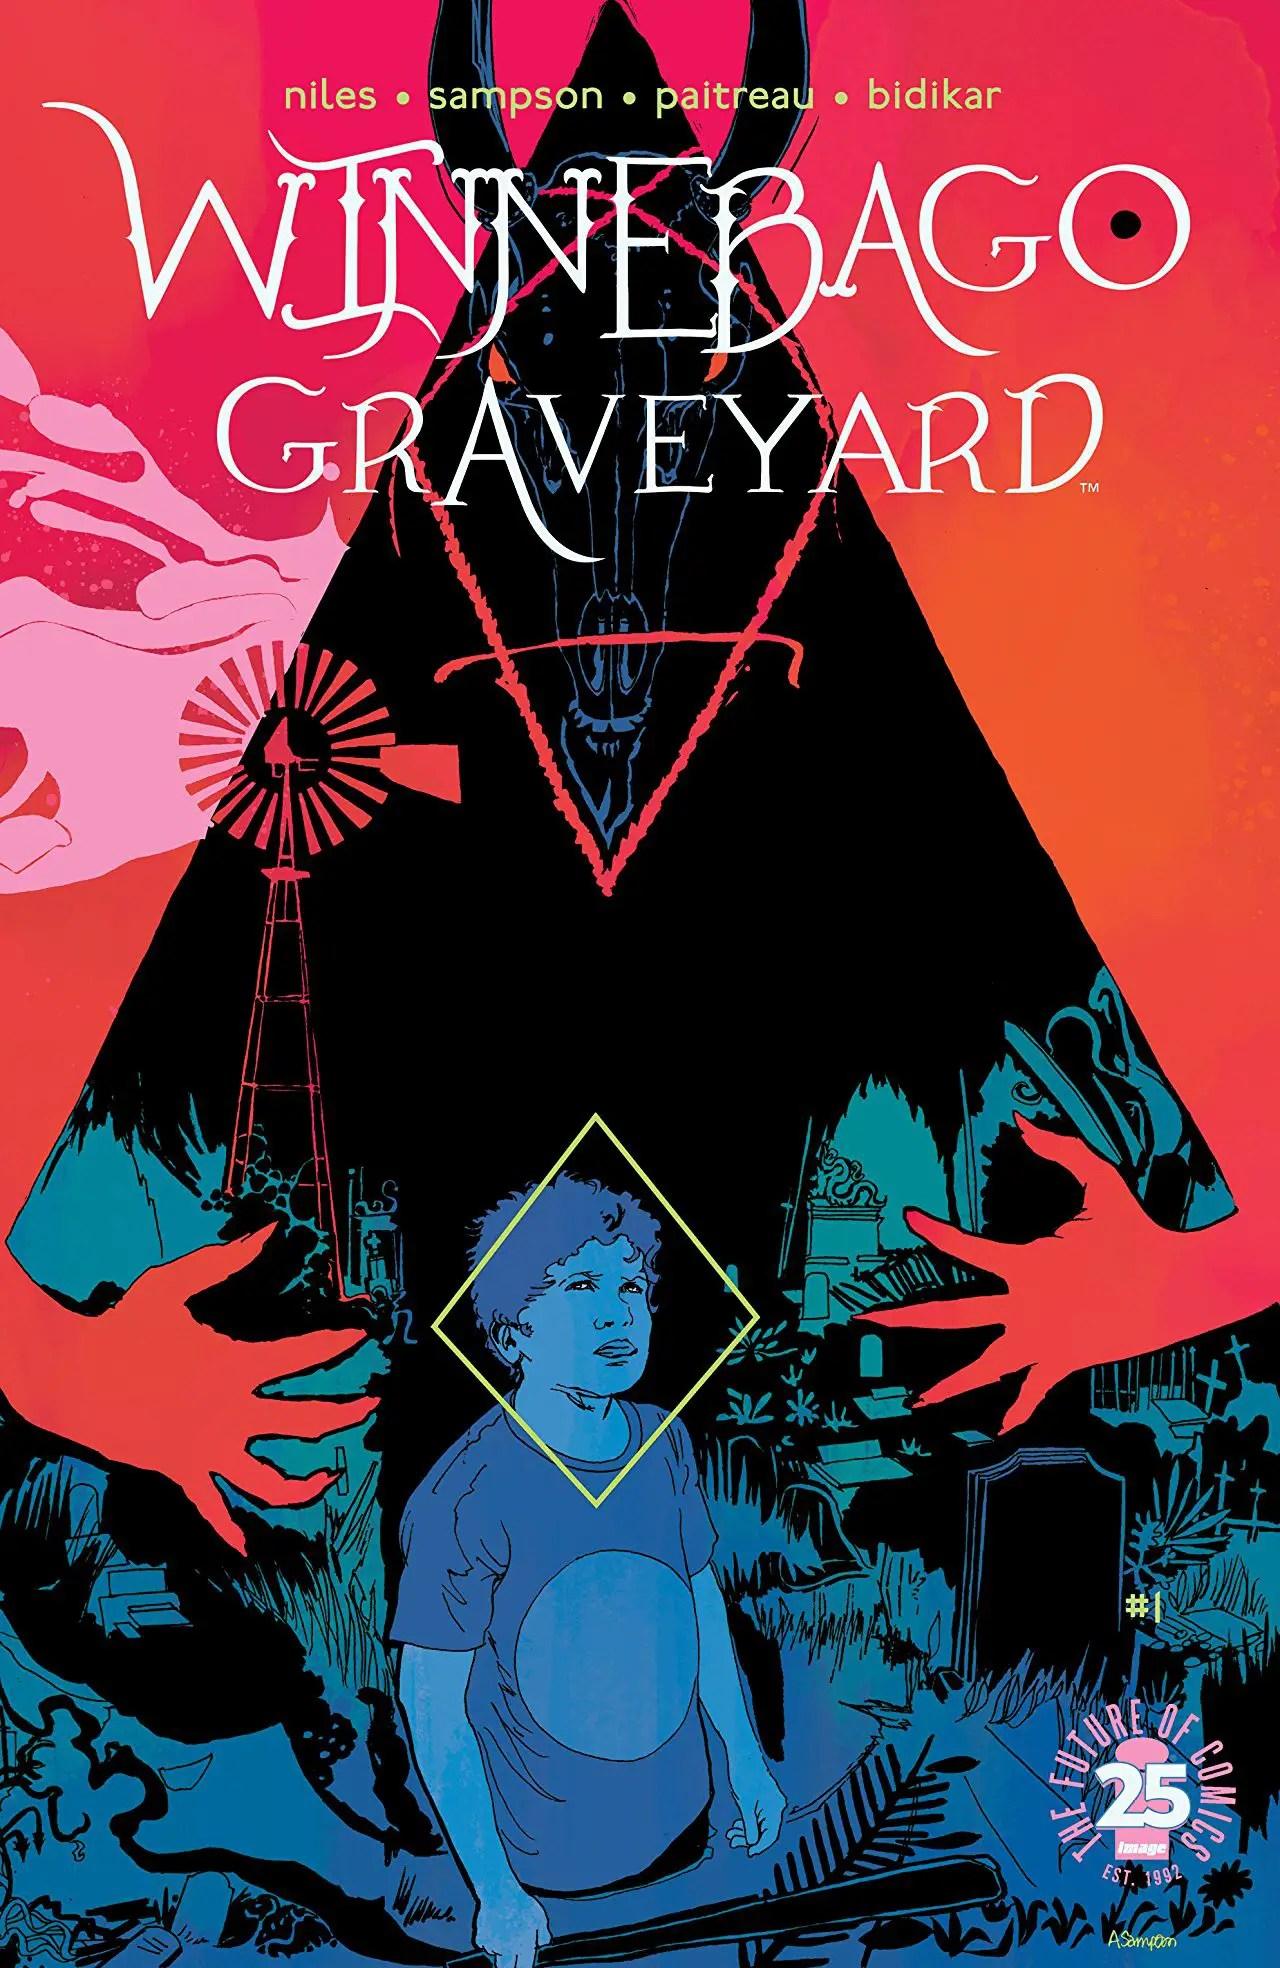 'Winnebago Graveyard' provides chilling horror and unflinching violence